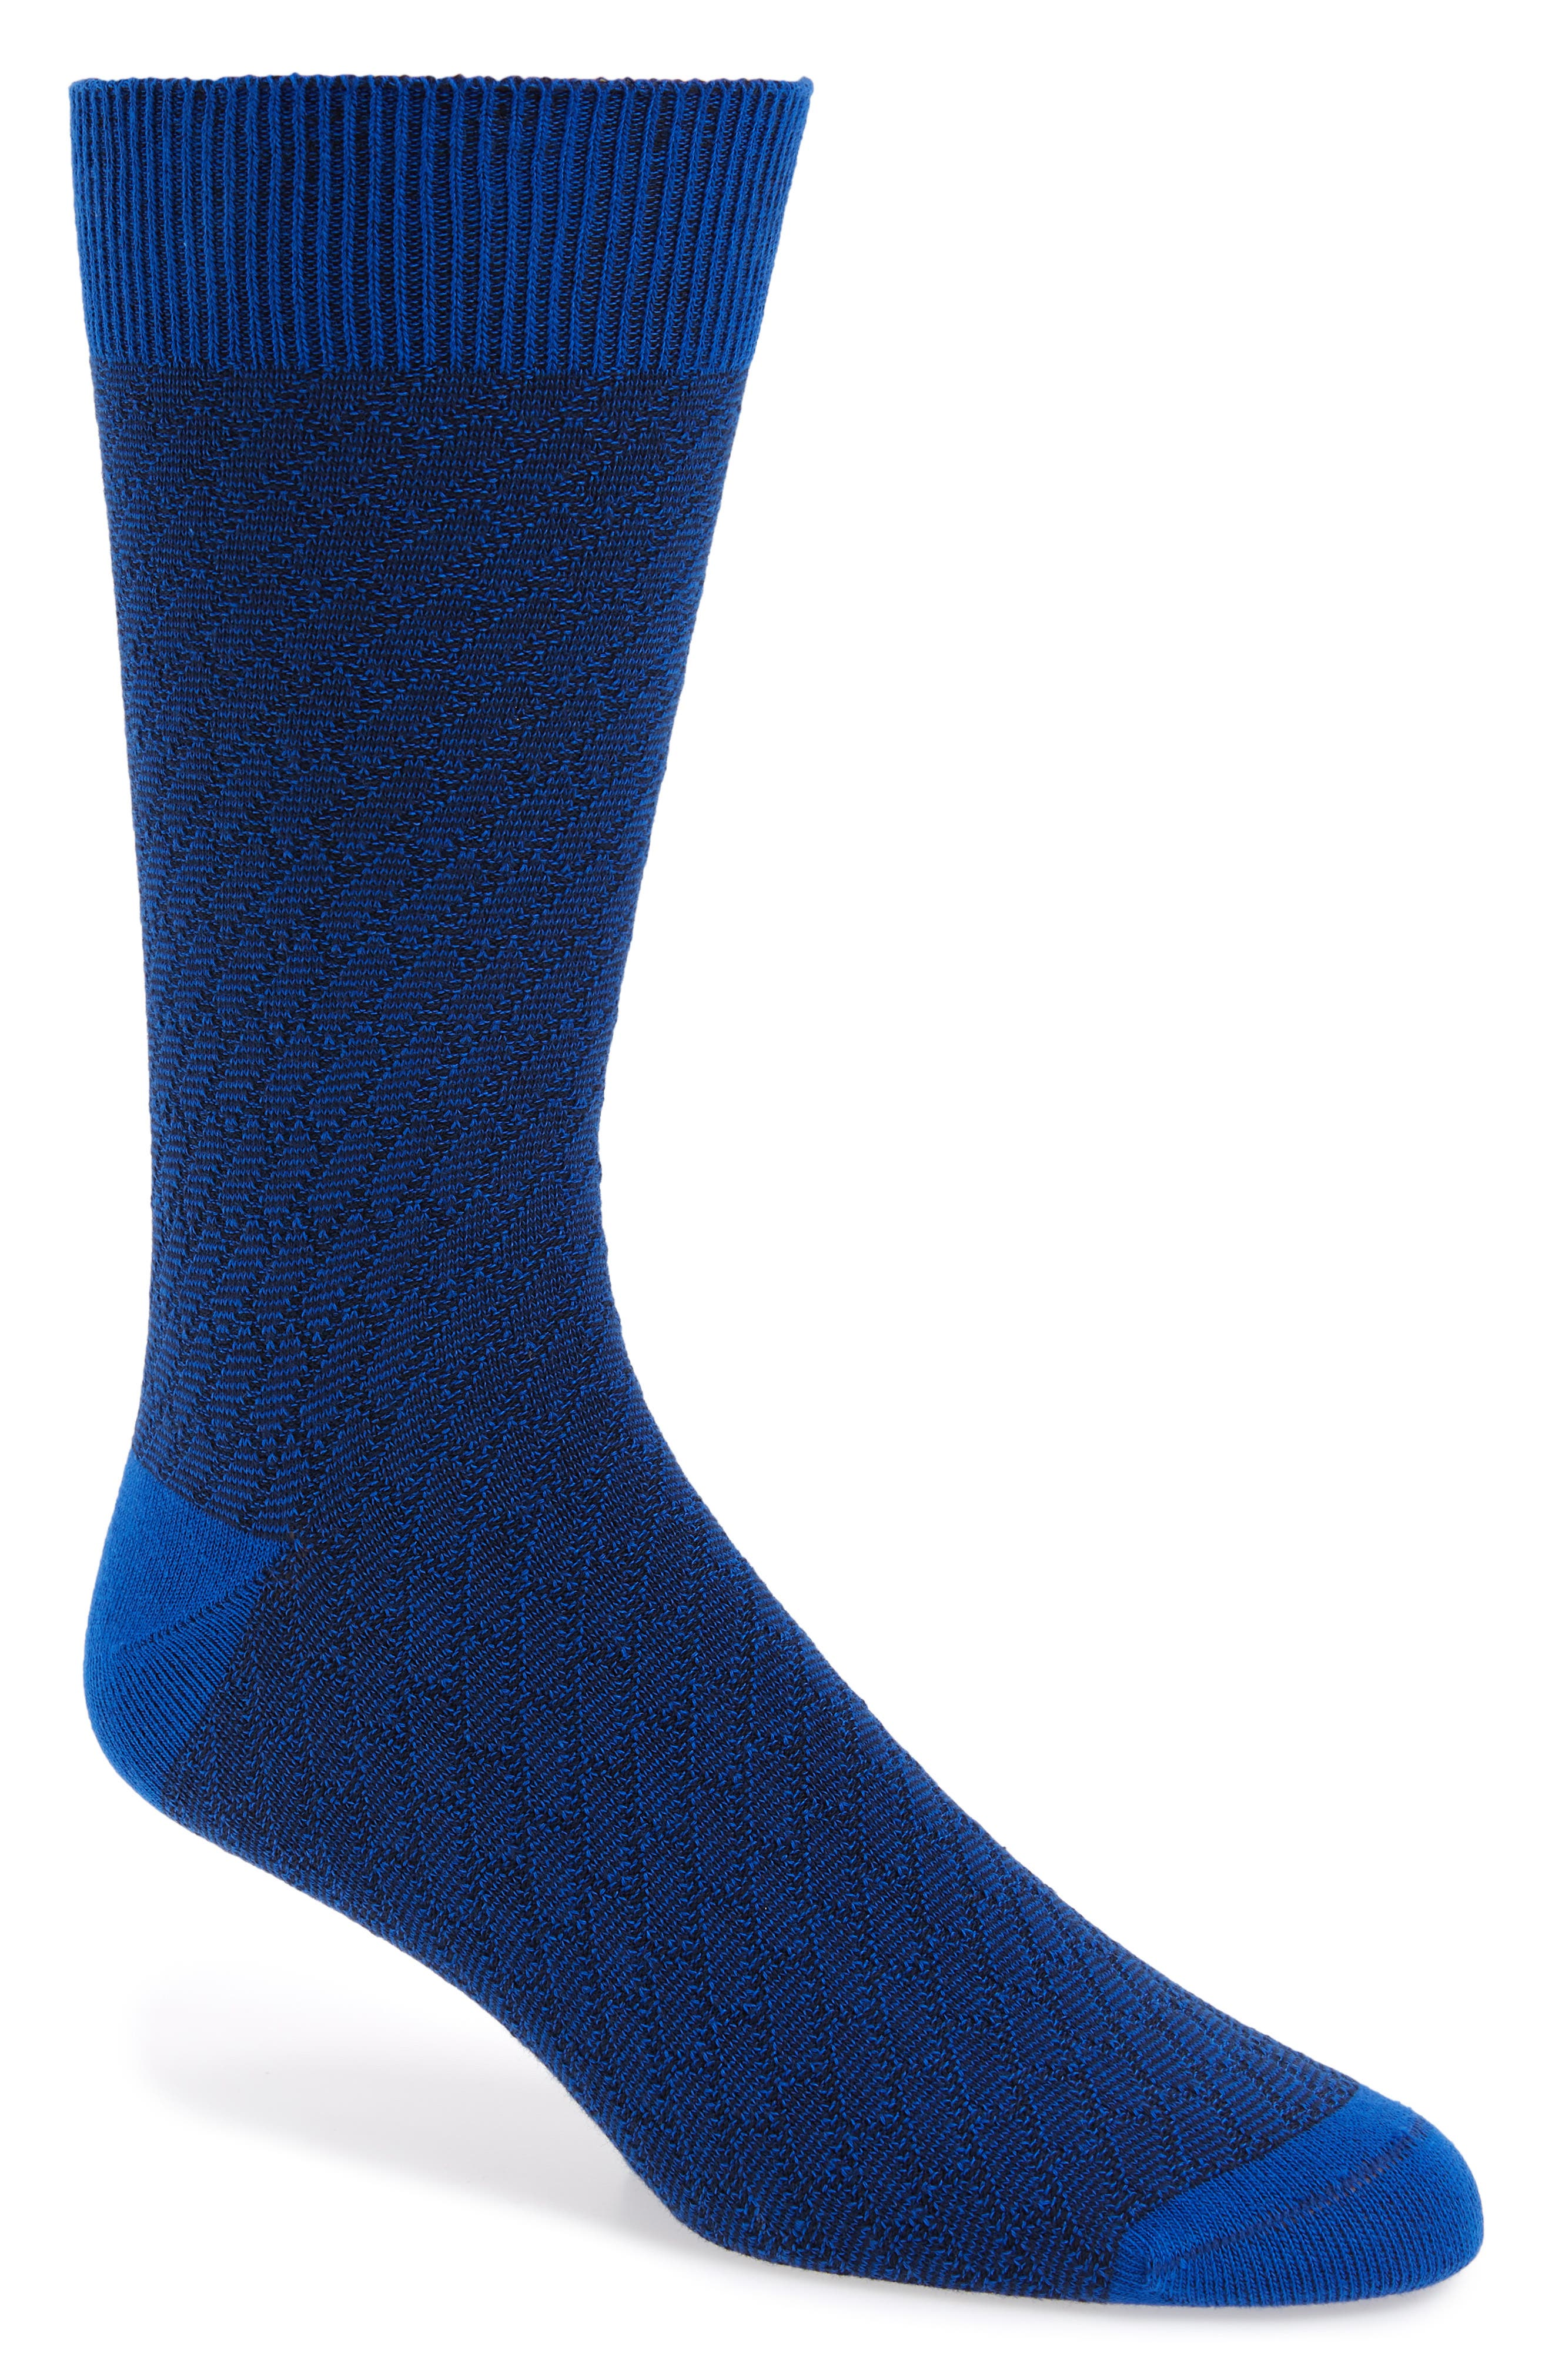 Lozpro Geometric Socks,                         Main,                         color, Blue